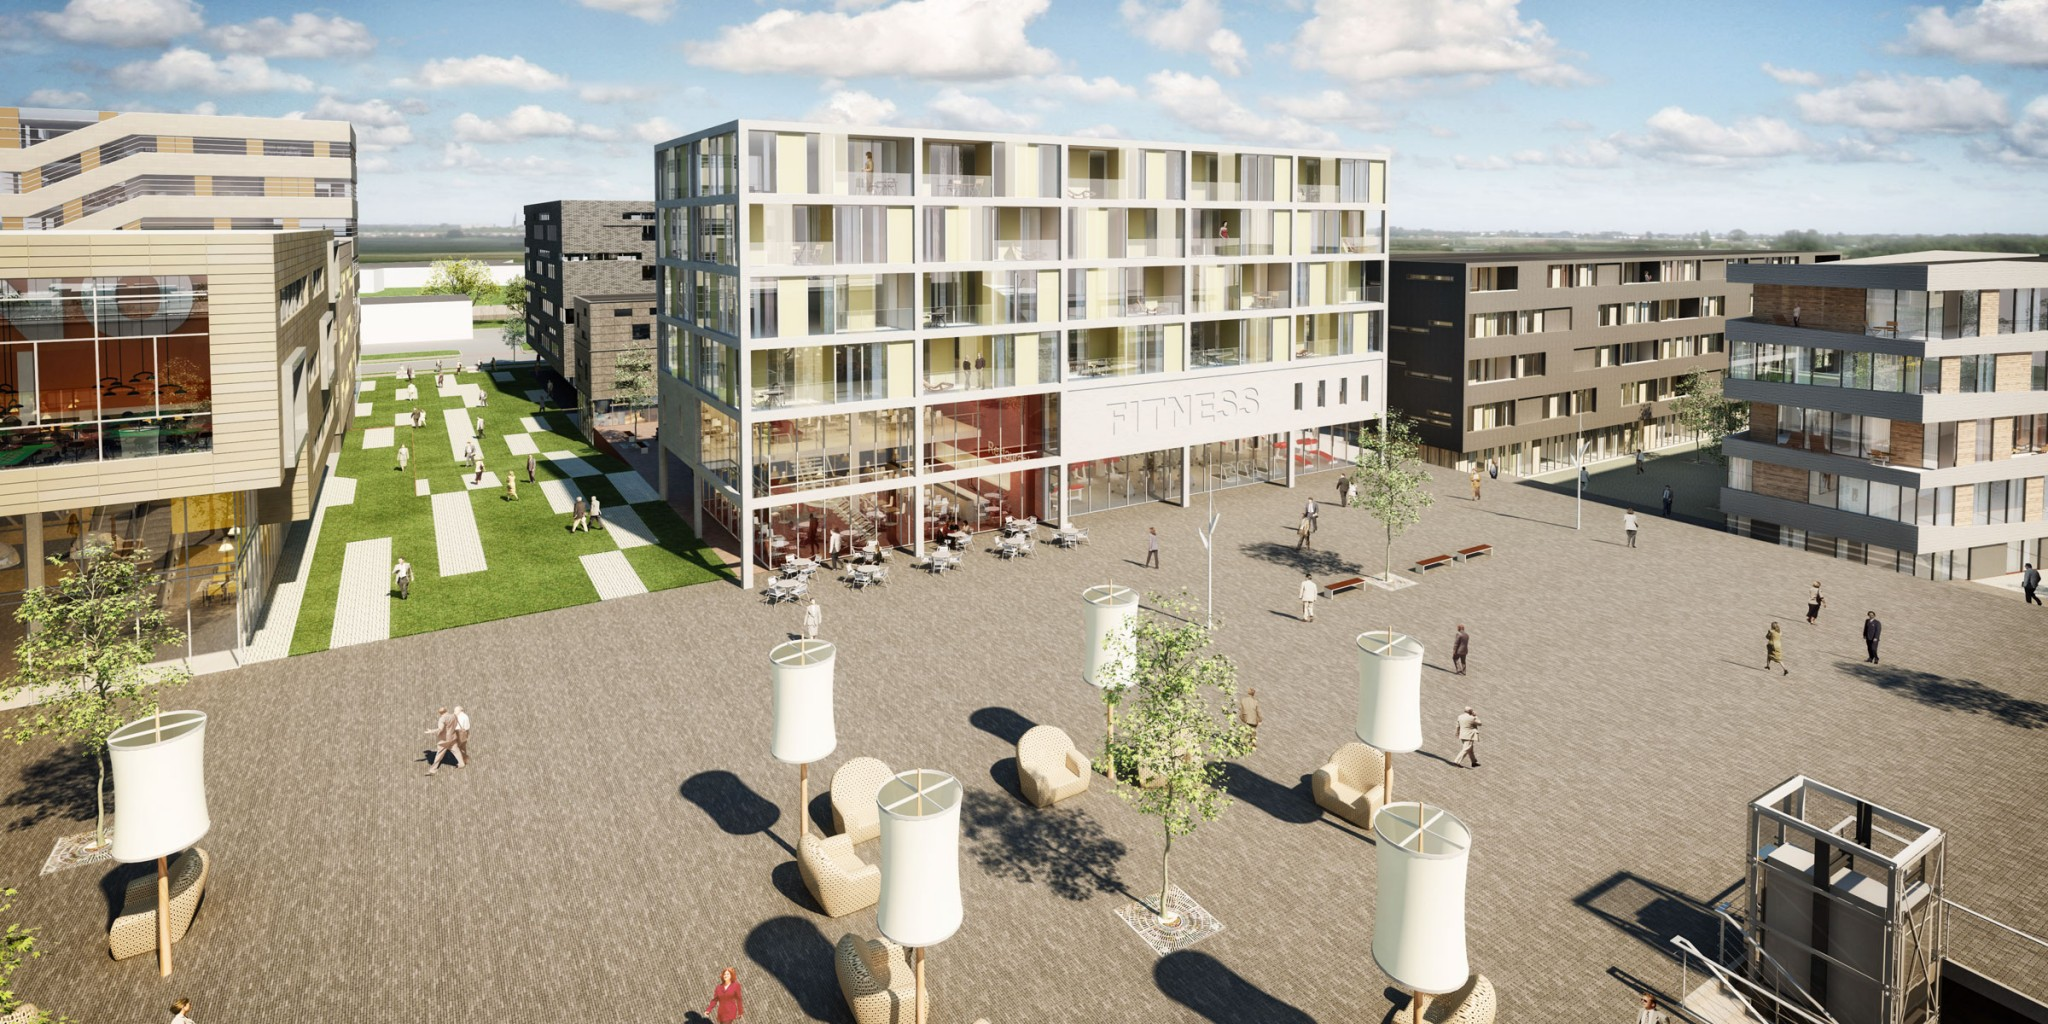 Ontwikkeling Lloyd`s terras Veendam - BINT architecten